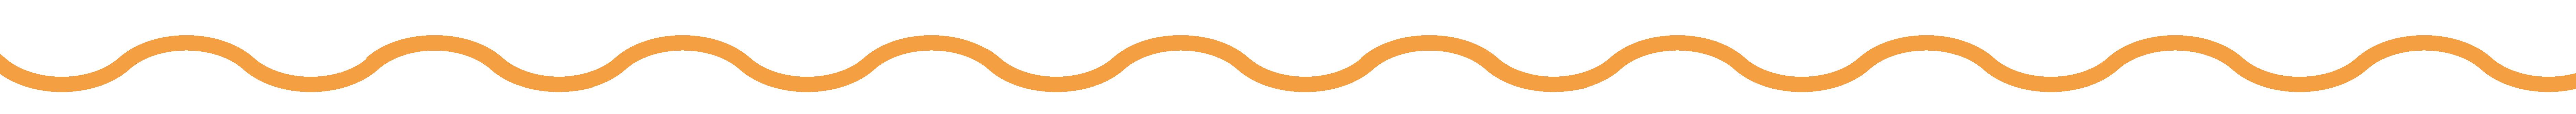 paths_orange-1